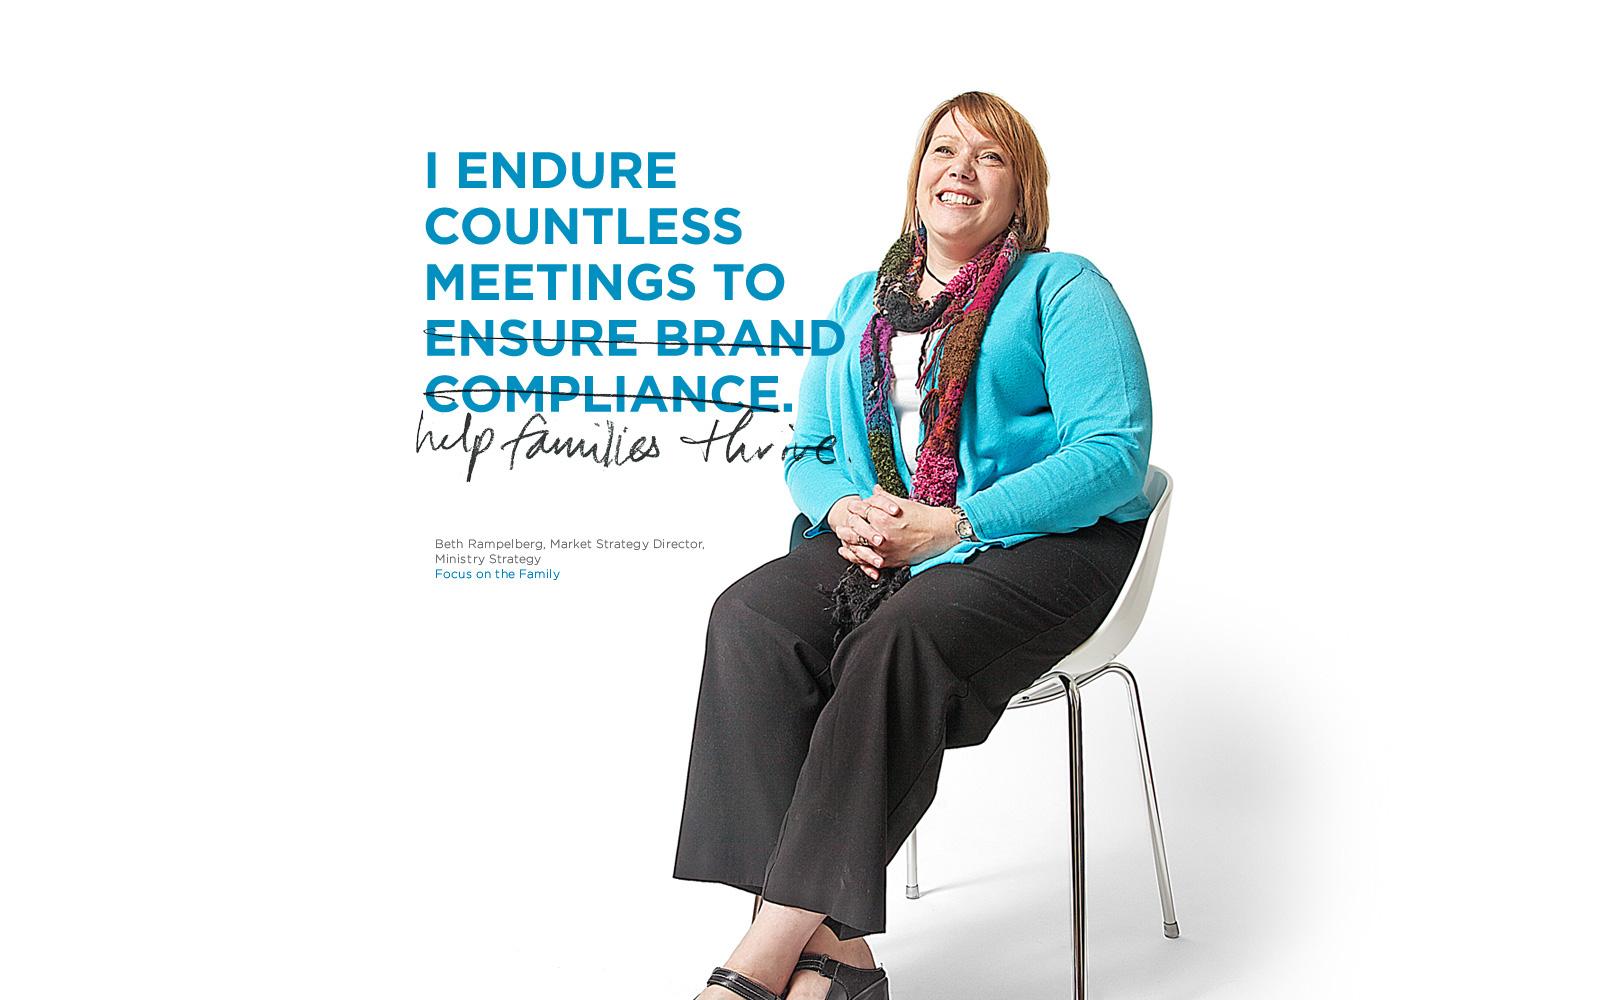 DOMOREGOOD | Building brands that truly matter.